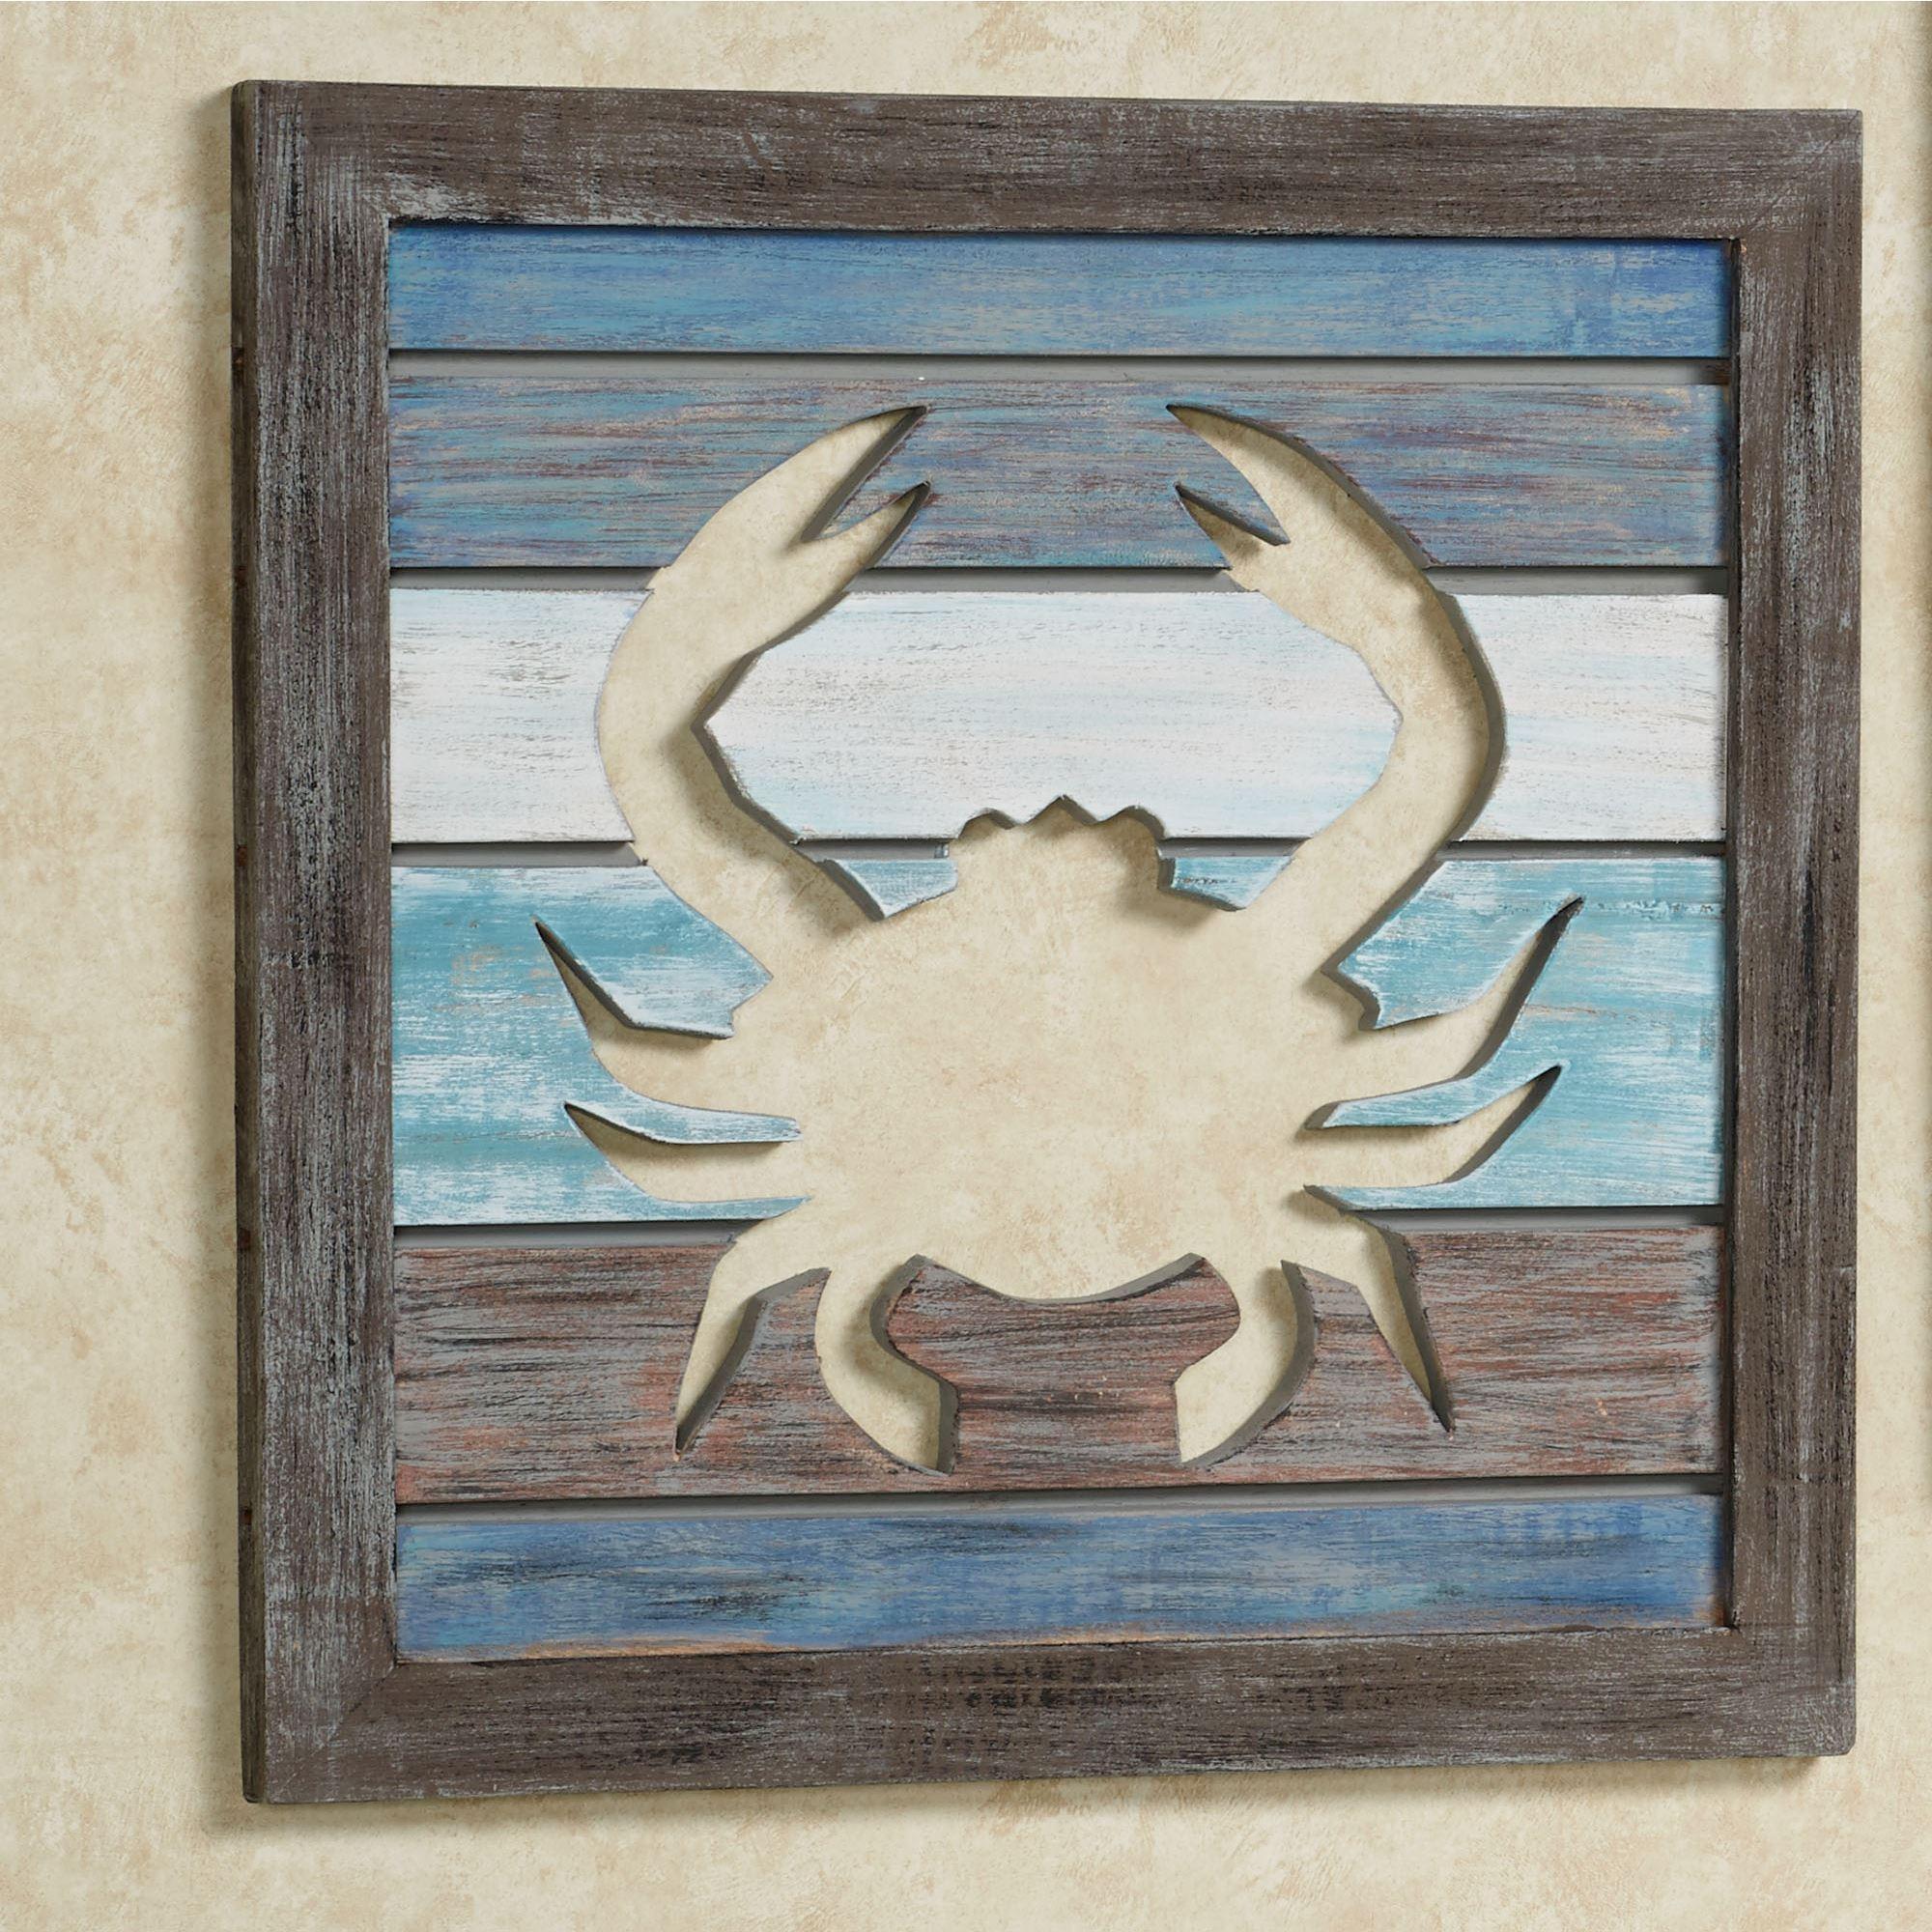 Sealife Cutout Slat Indoor Outdoor Coastal Wall Art Pertaining To Blue And Brown Wall Art (Image 16 of 20)